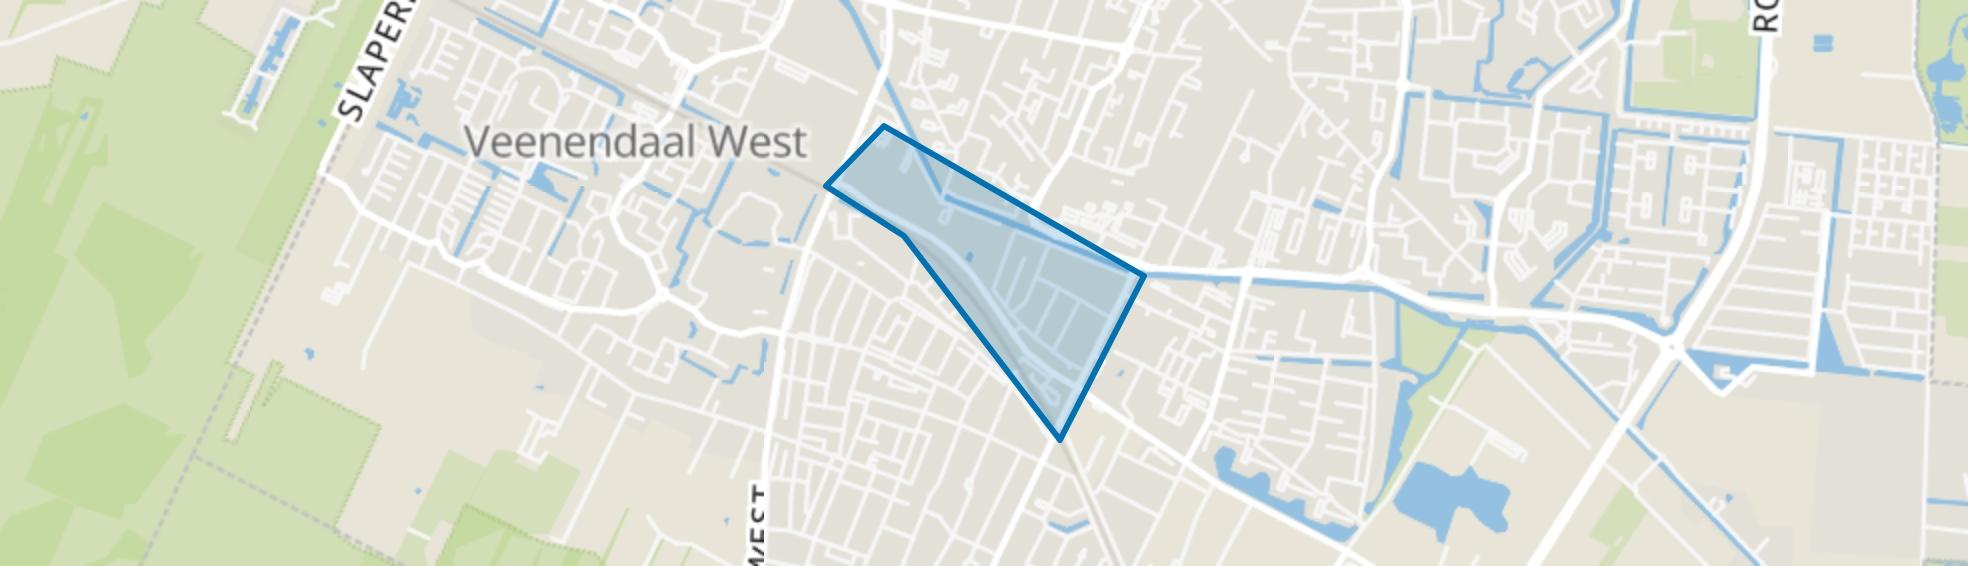 't Goeie Spoor en omgeving, Veenendaal map